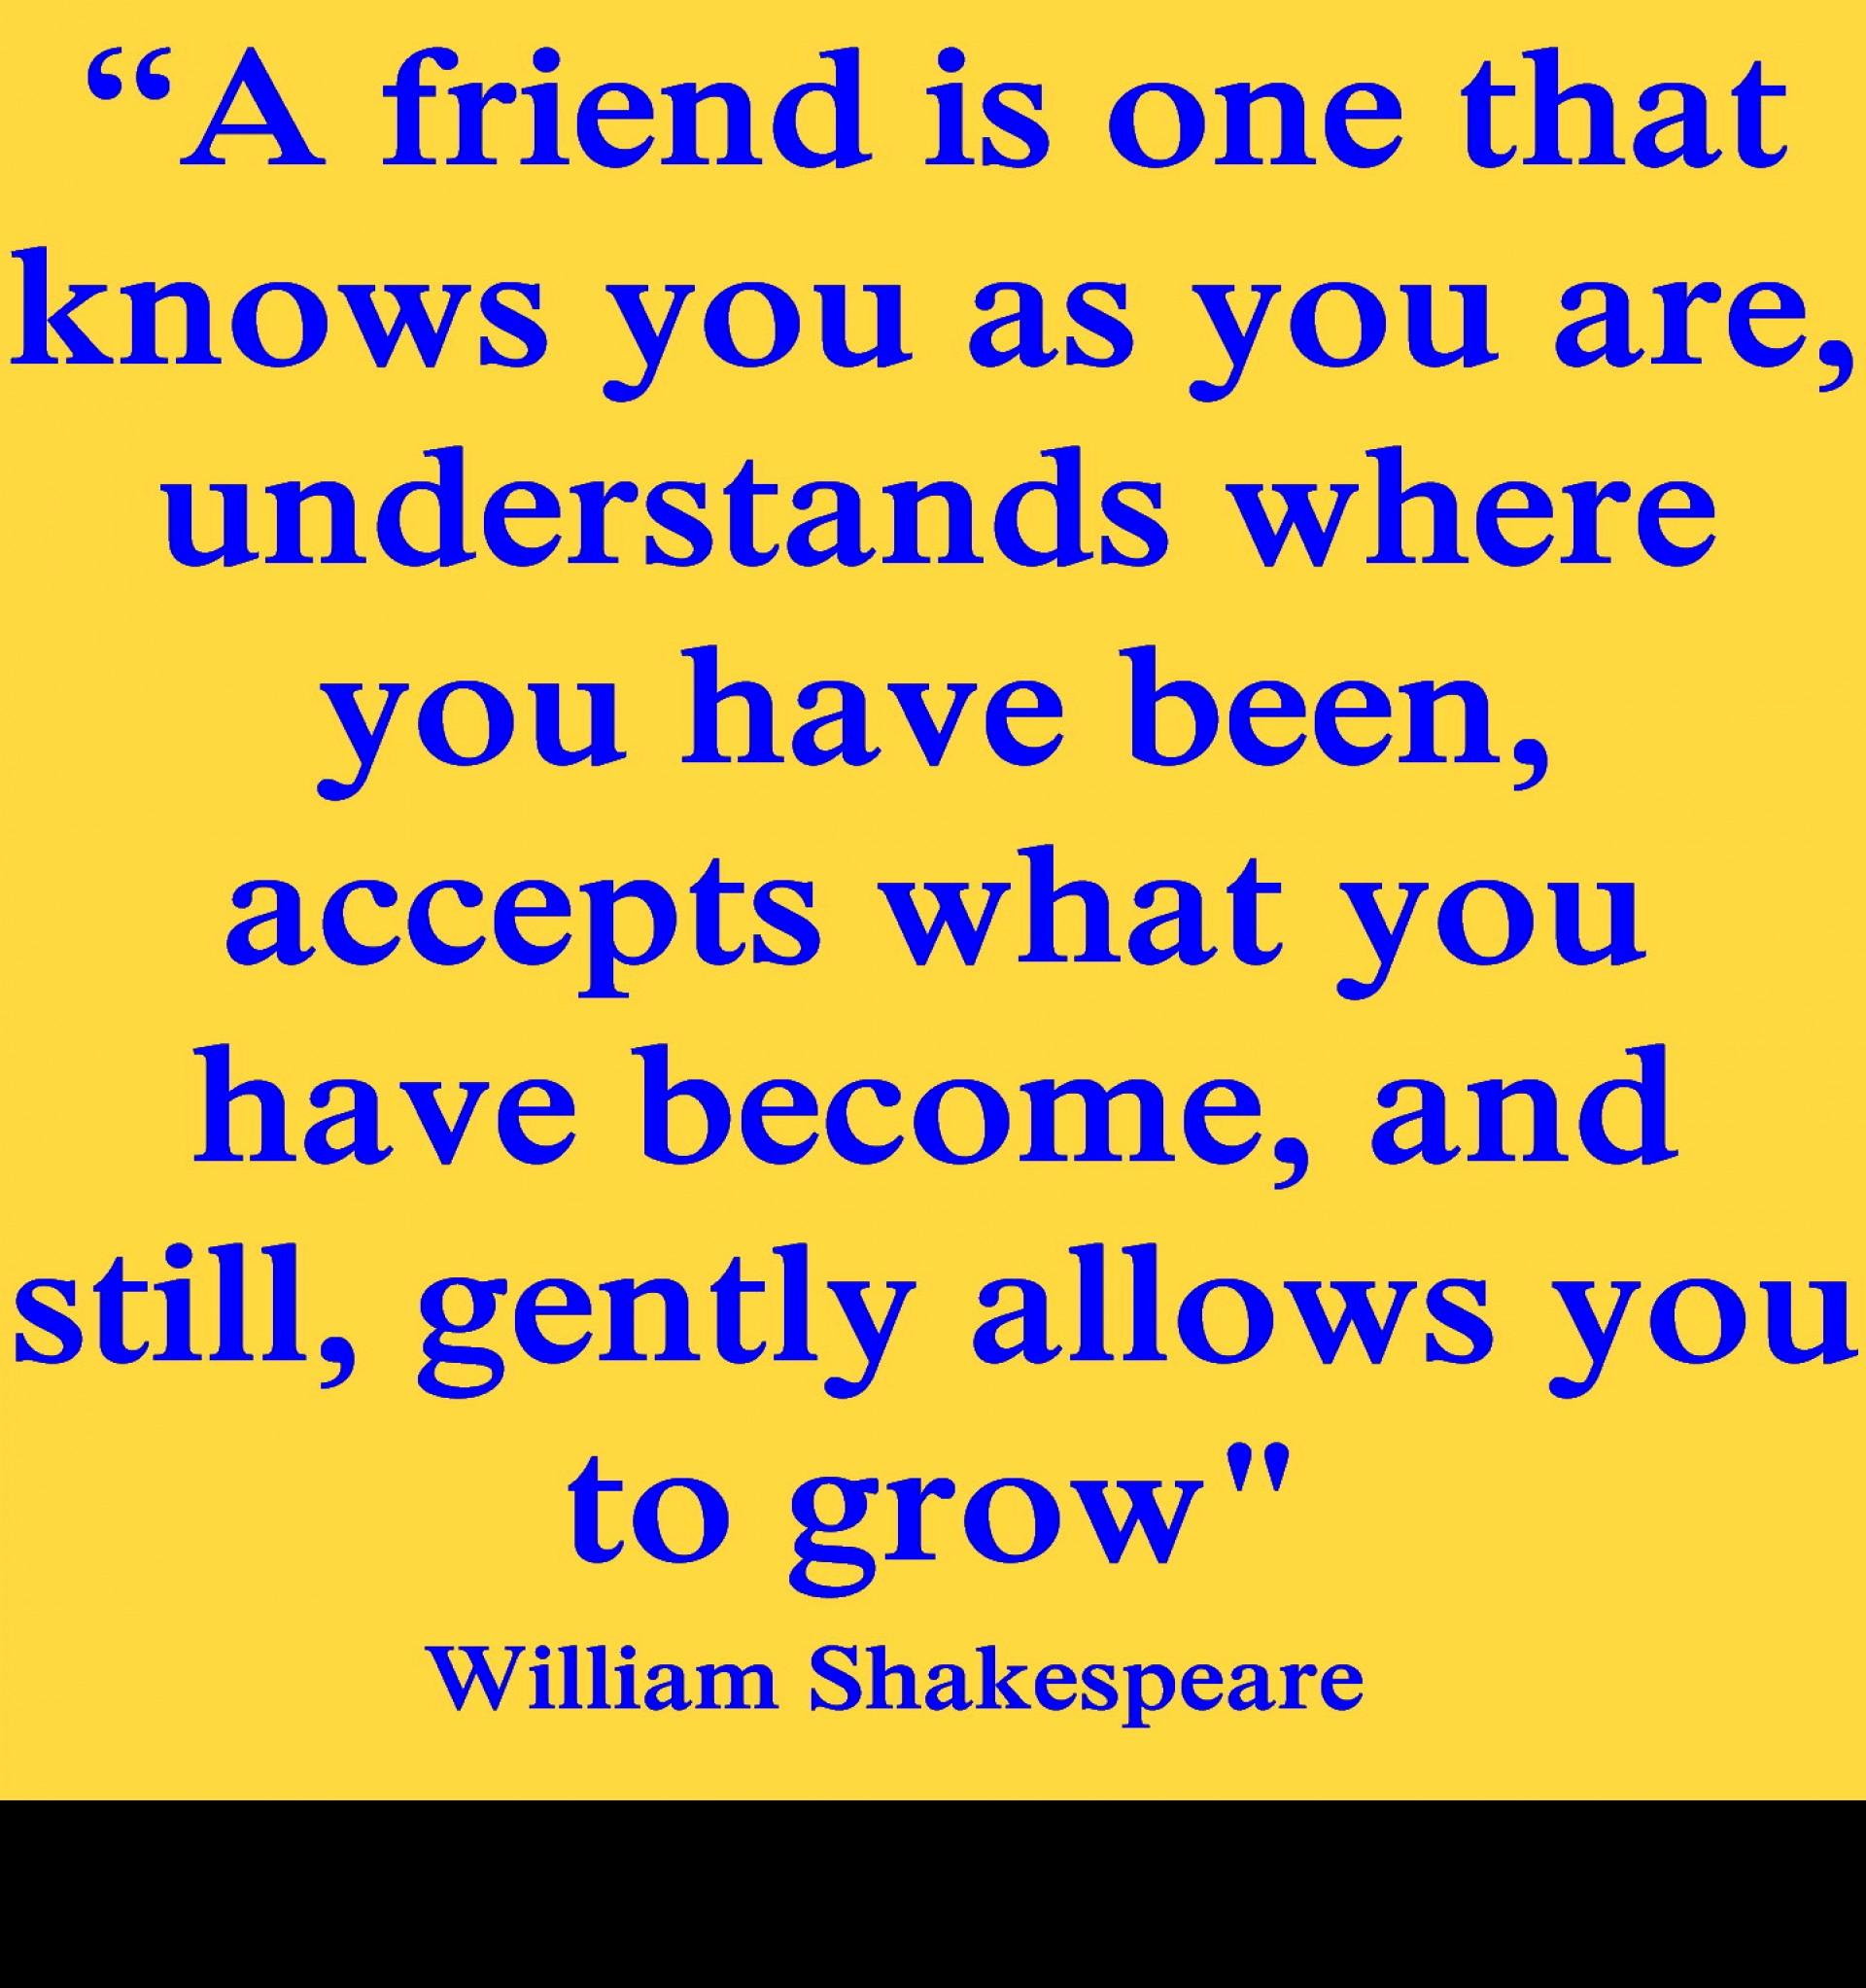 002 Qualities Of Good Friends Essay Lqs178 Amazing A Friend In Hindi Short 1920